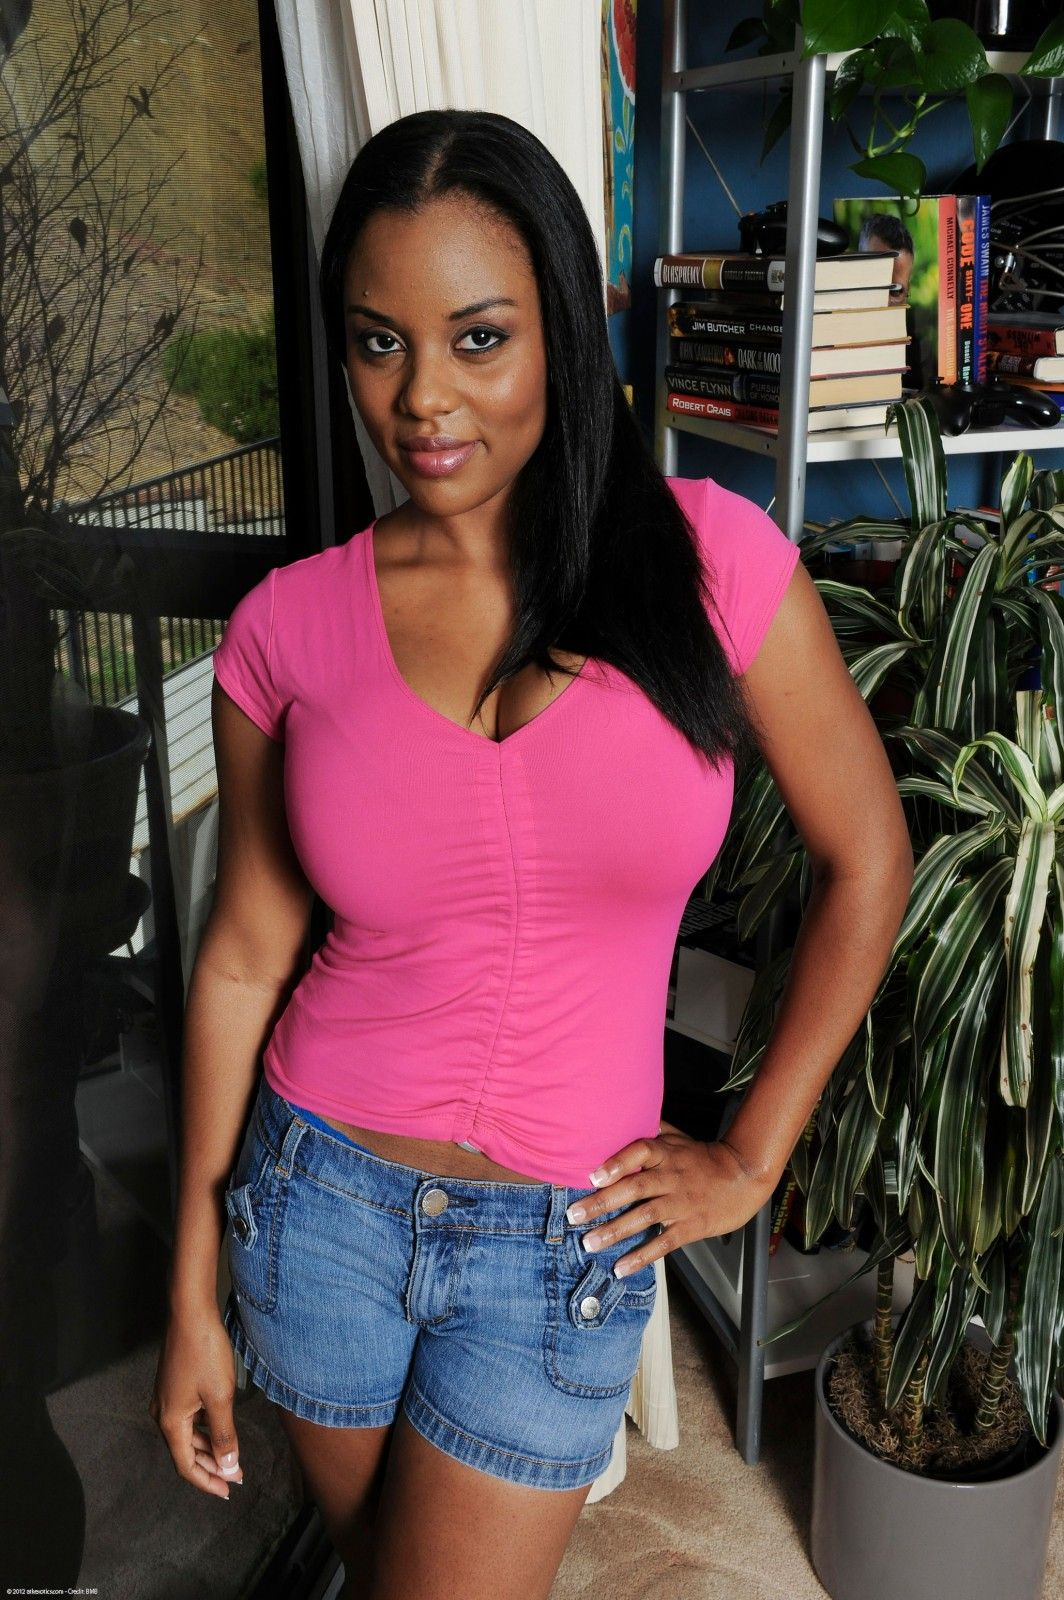 thick #curvy #ebony #model #babe #sexy #hottie #woman #african